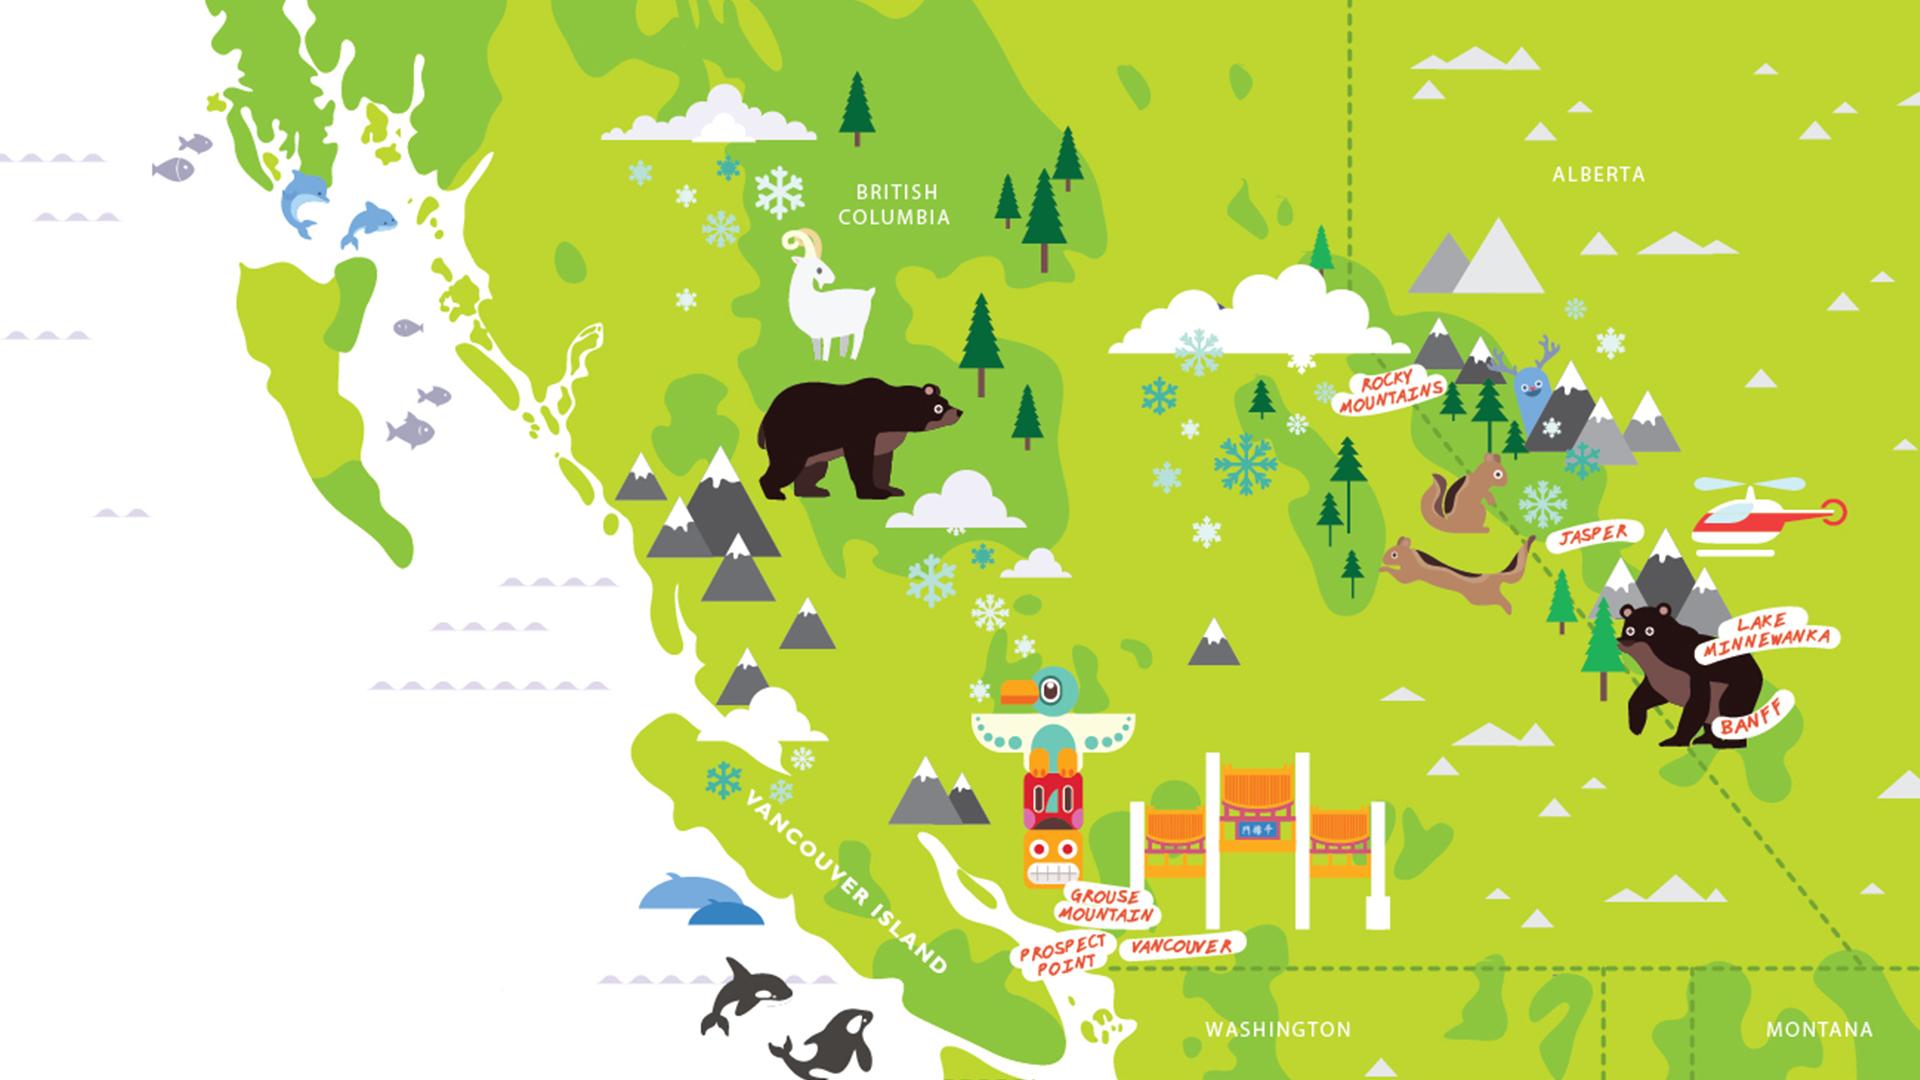 Michelle Hird Map Design